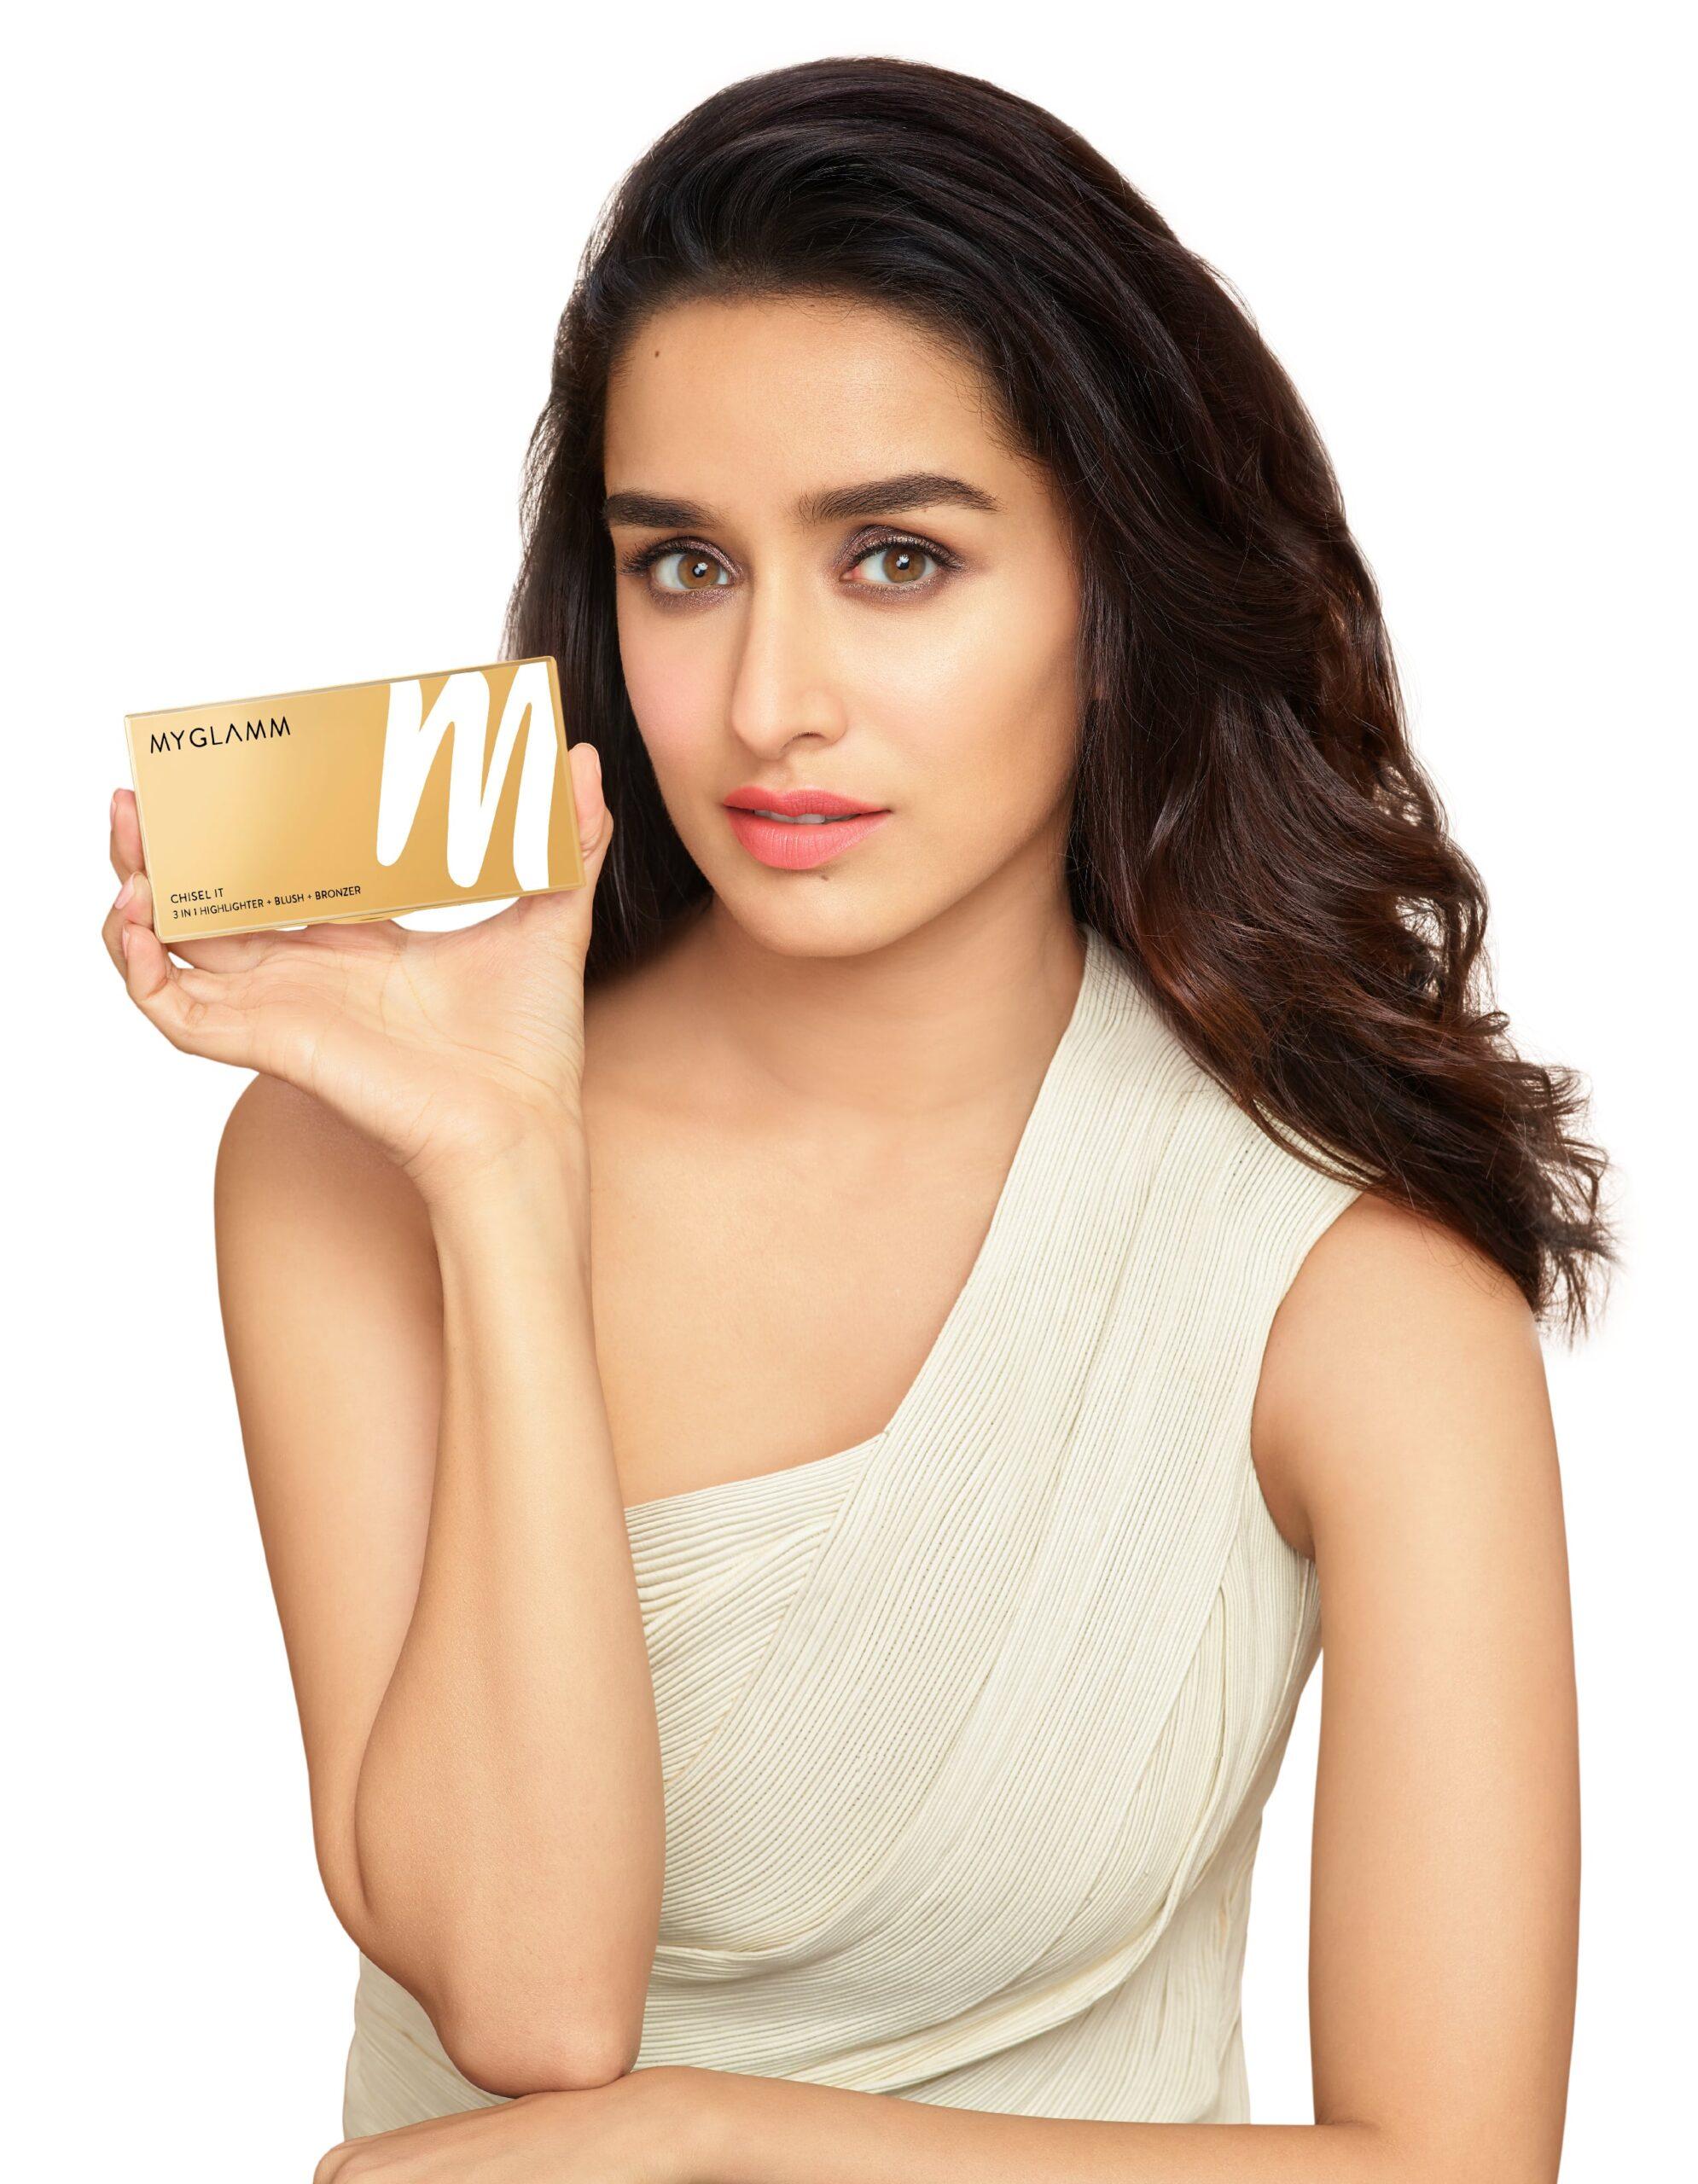 MyGlamm names Shraddha Kapoor as their brand ambassador